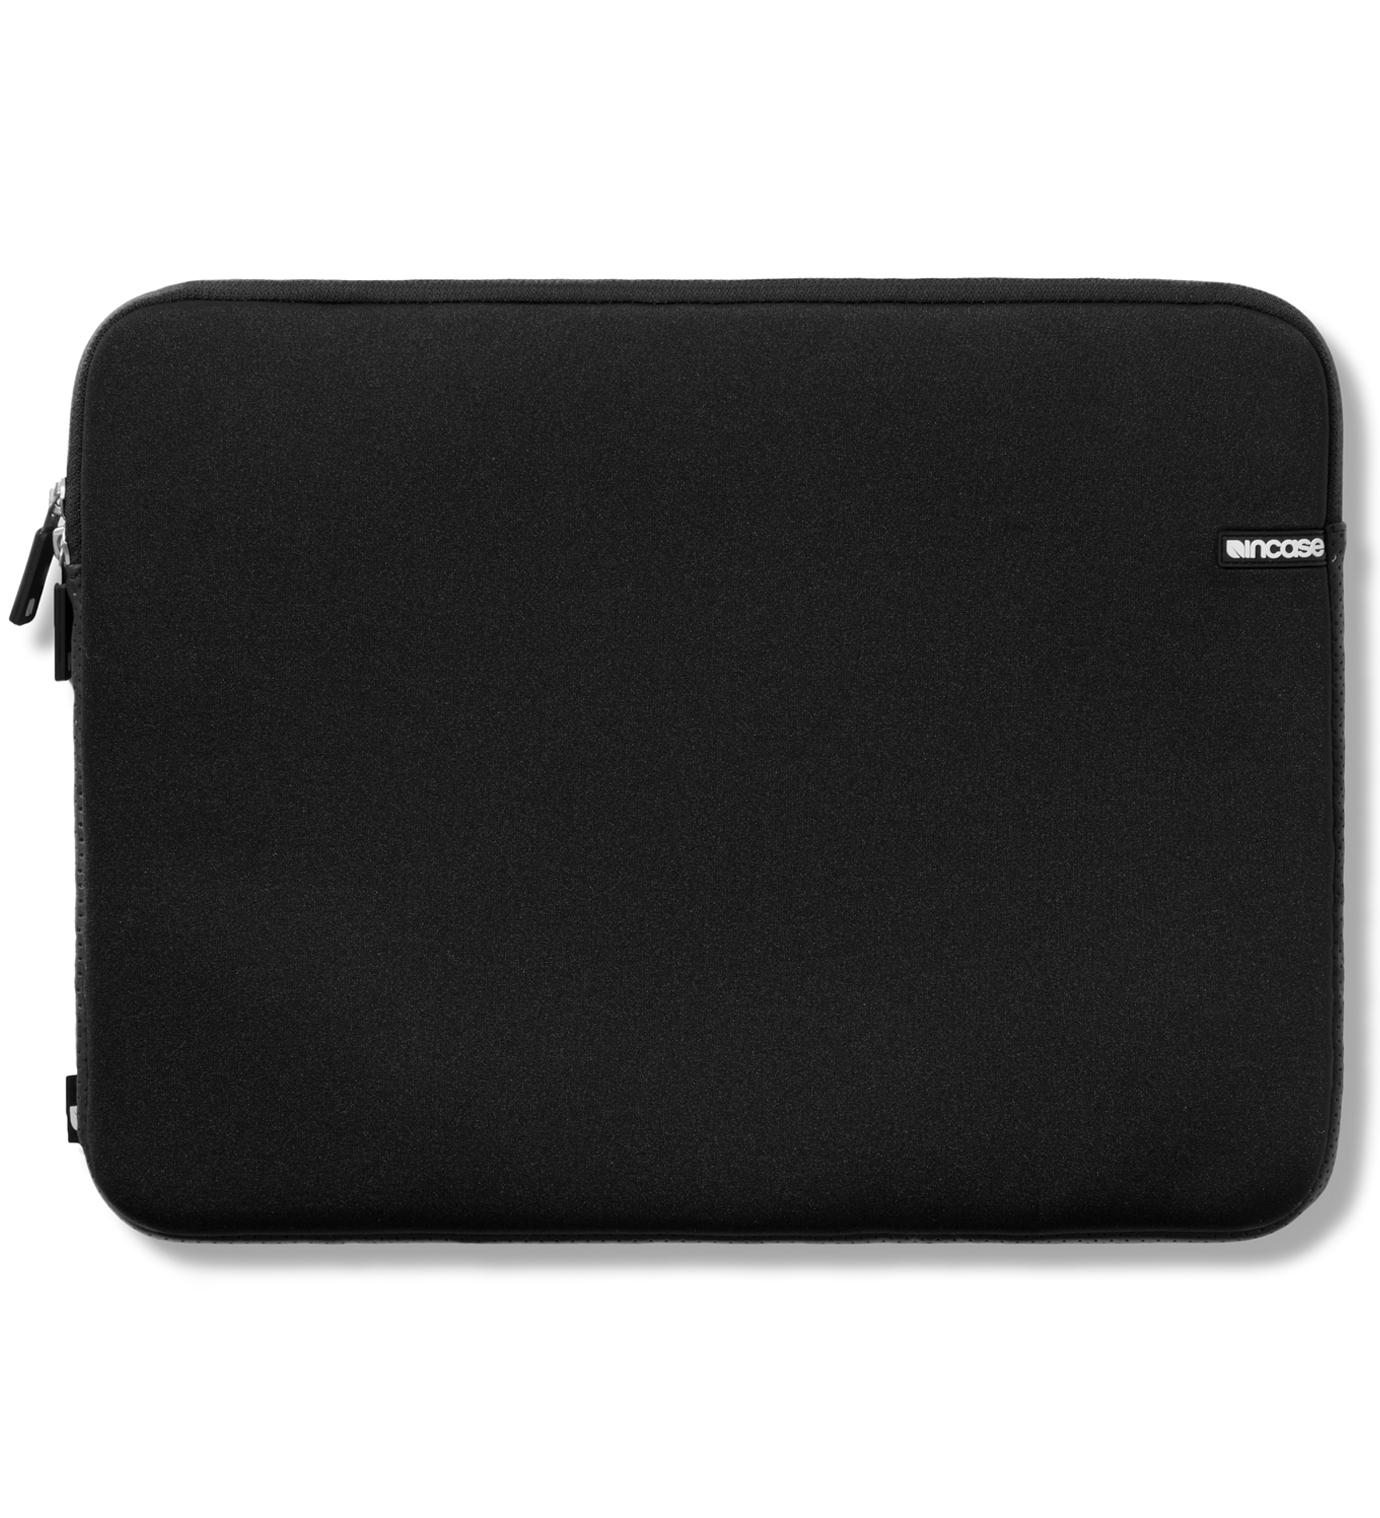 "Incase Black Neoprene Sleeve for Macbook Pro 15"""